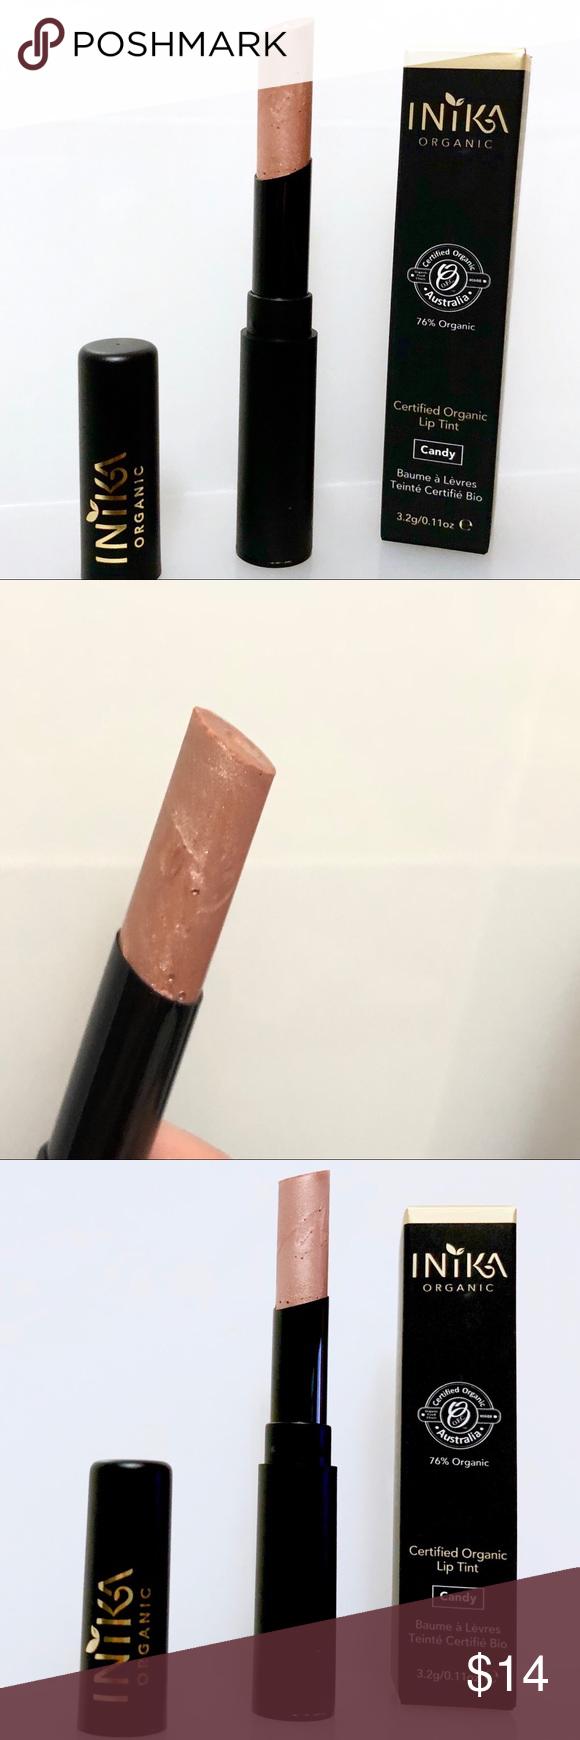 3/25 INIKA Certified Organic Lip Tint Lipstick Boutique